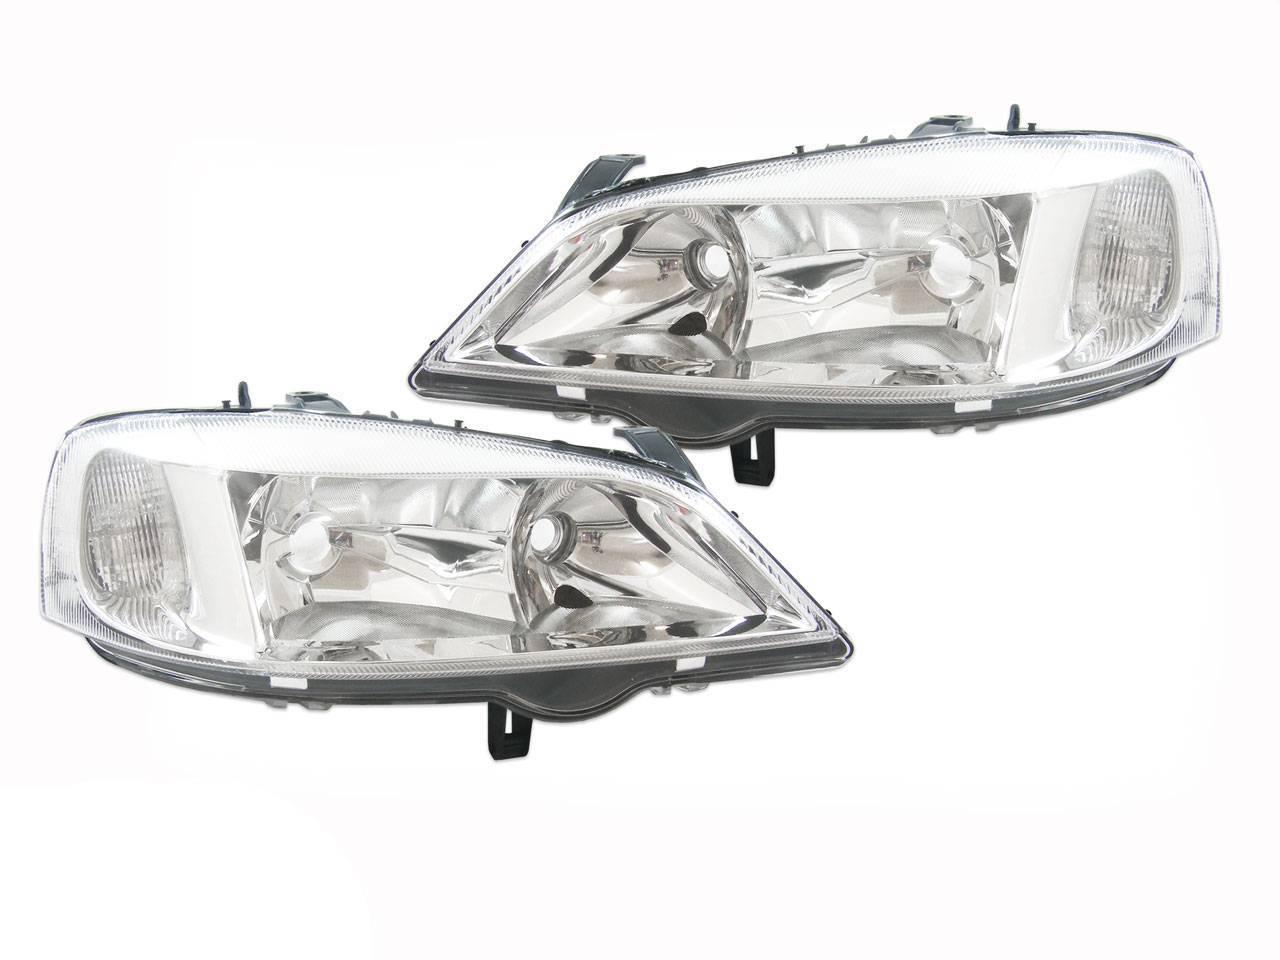 Head Lights Holden Ts Astra 98 99 00 01 02 03 04 Chrome